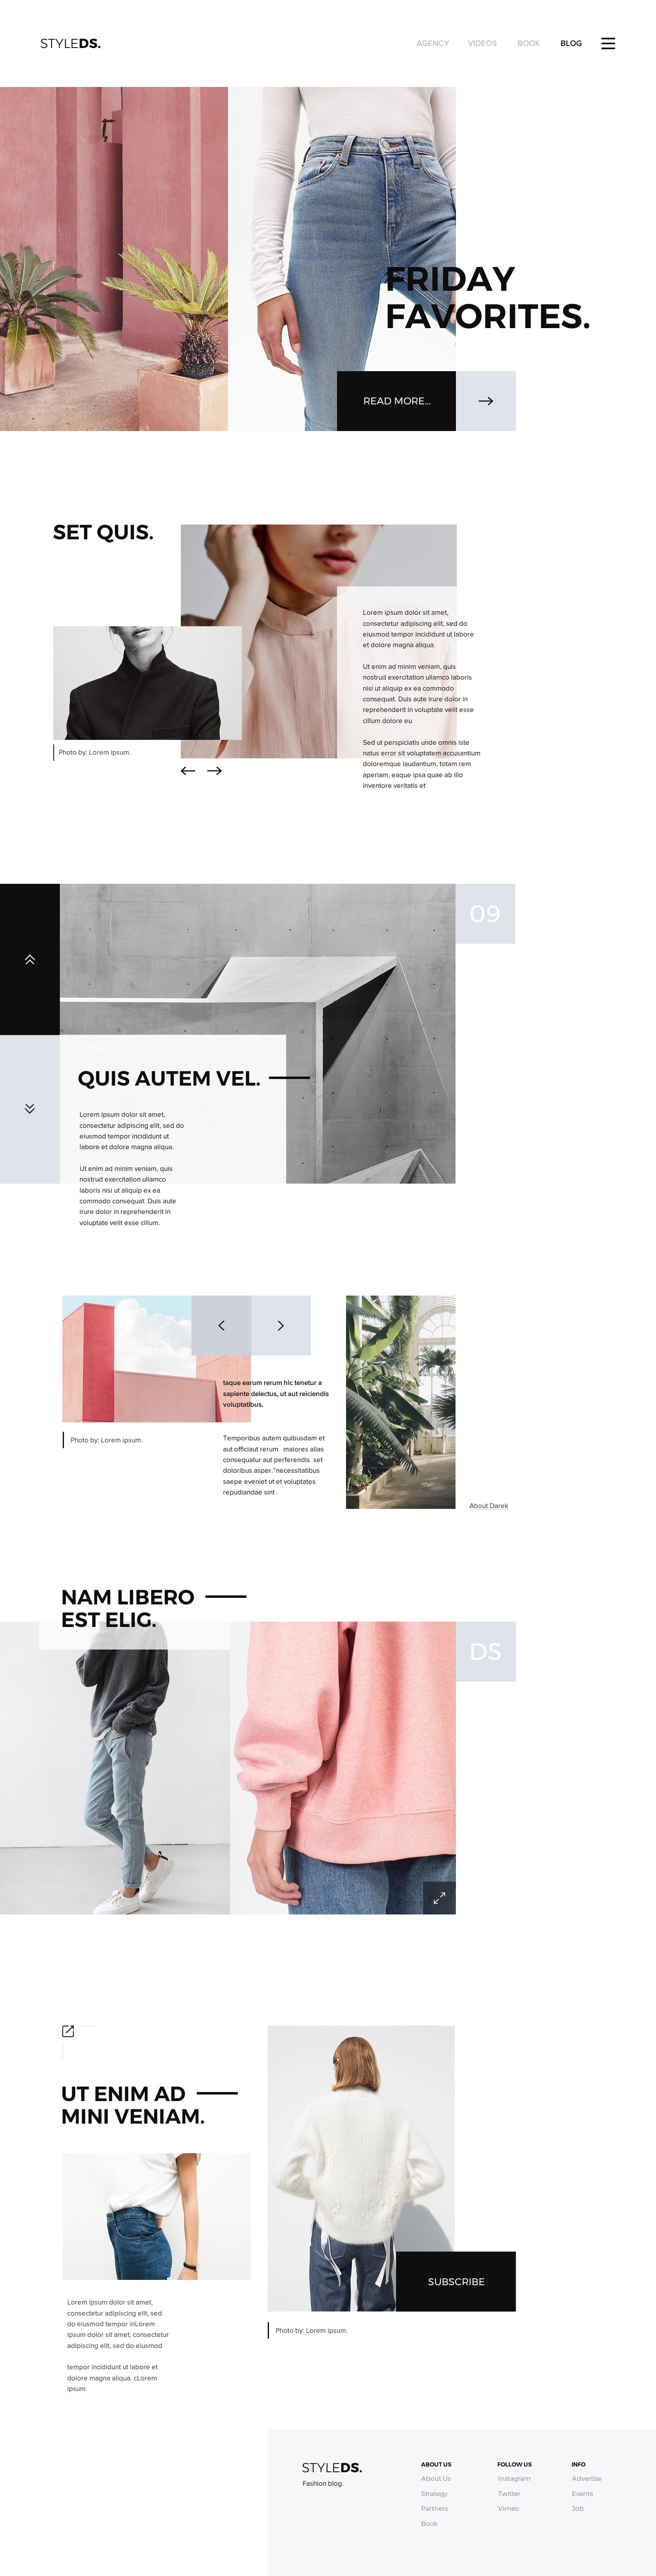 contoh desain web - blog